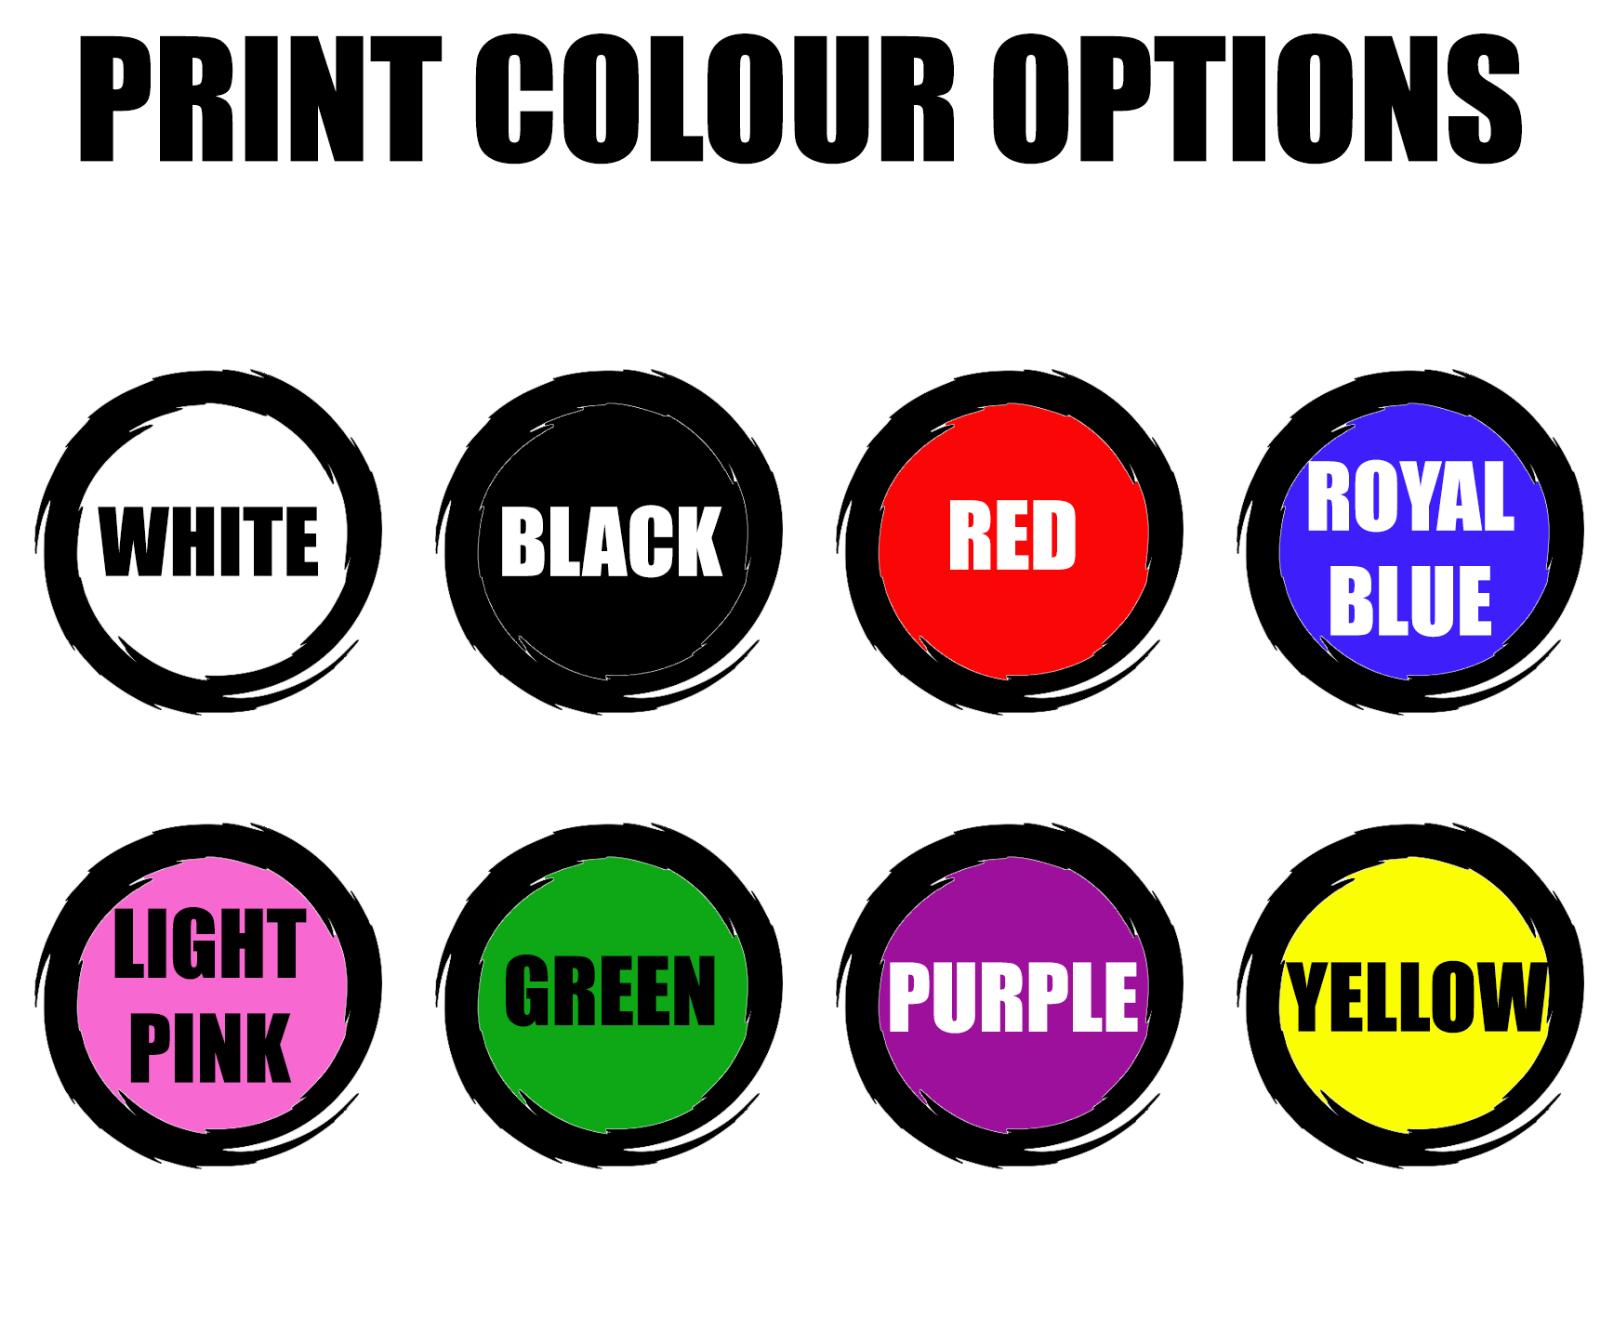 Mens Personalised Printed T-Shirt Unisex Custom Design Logo Uniform Stag Do Fun 3